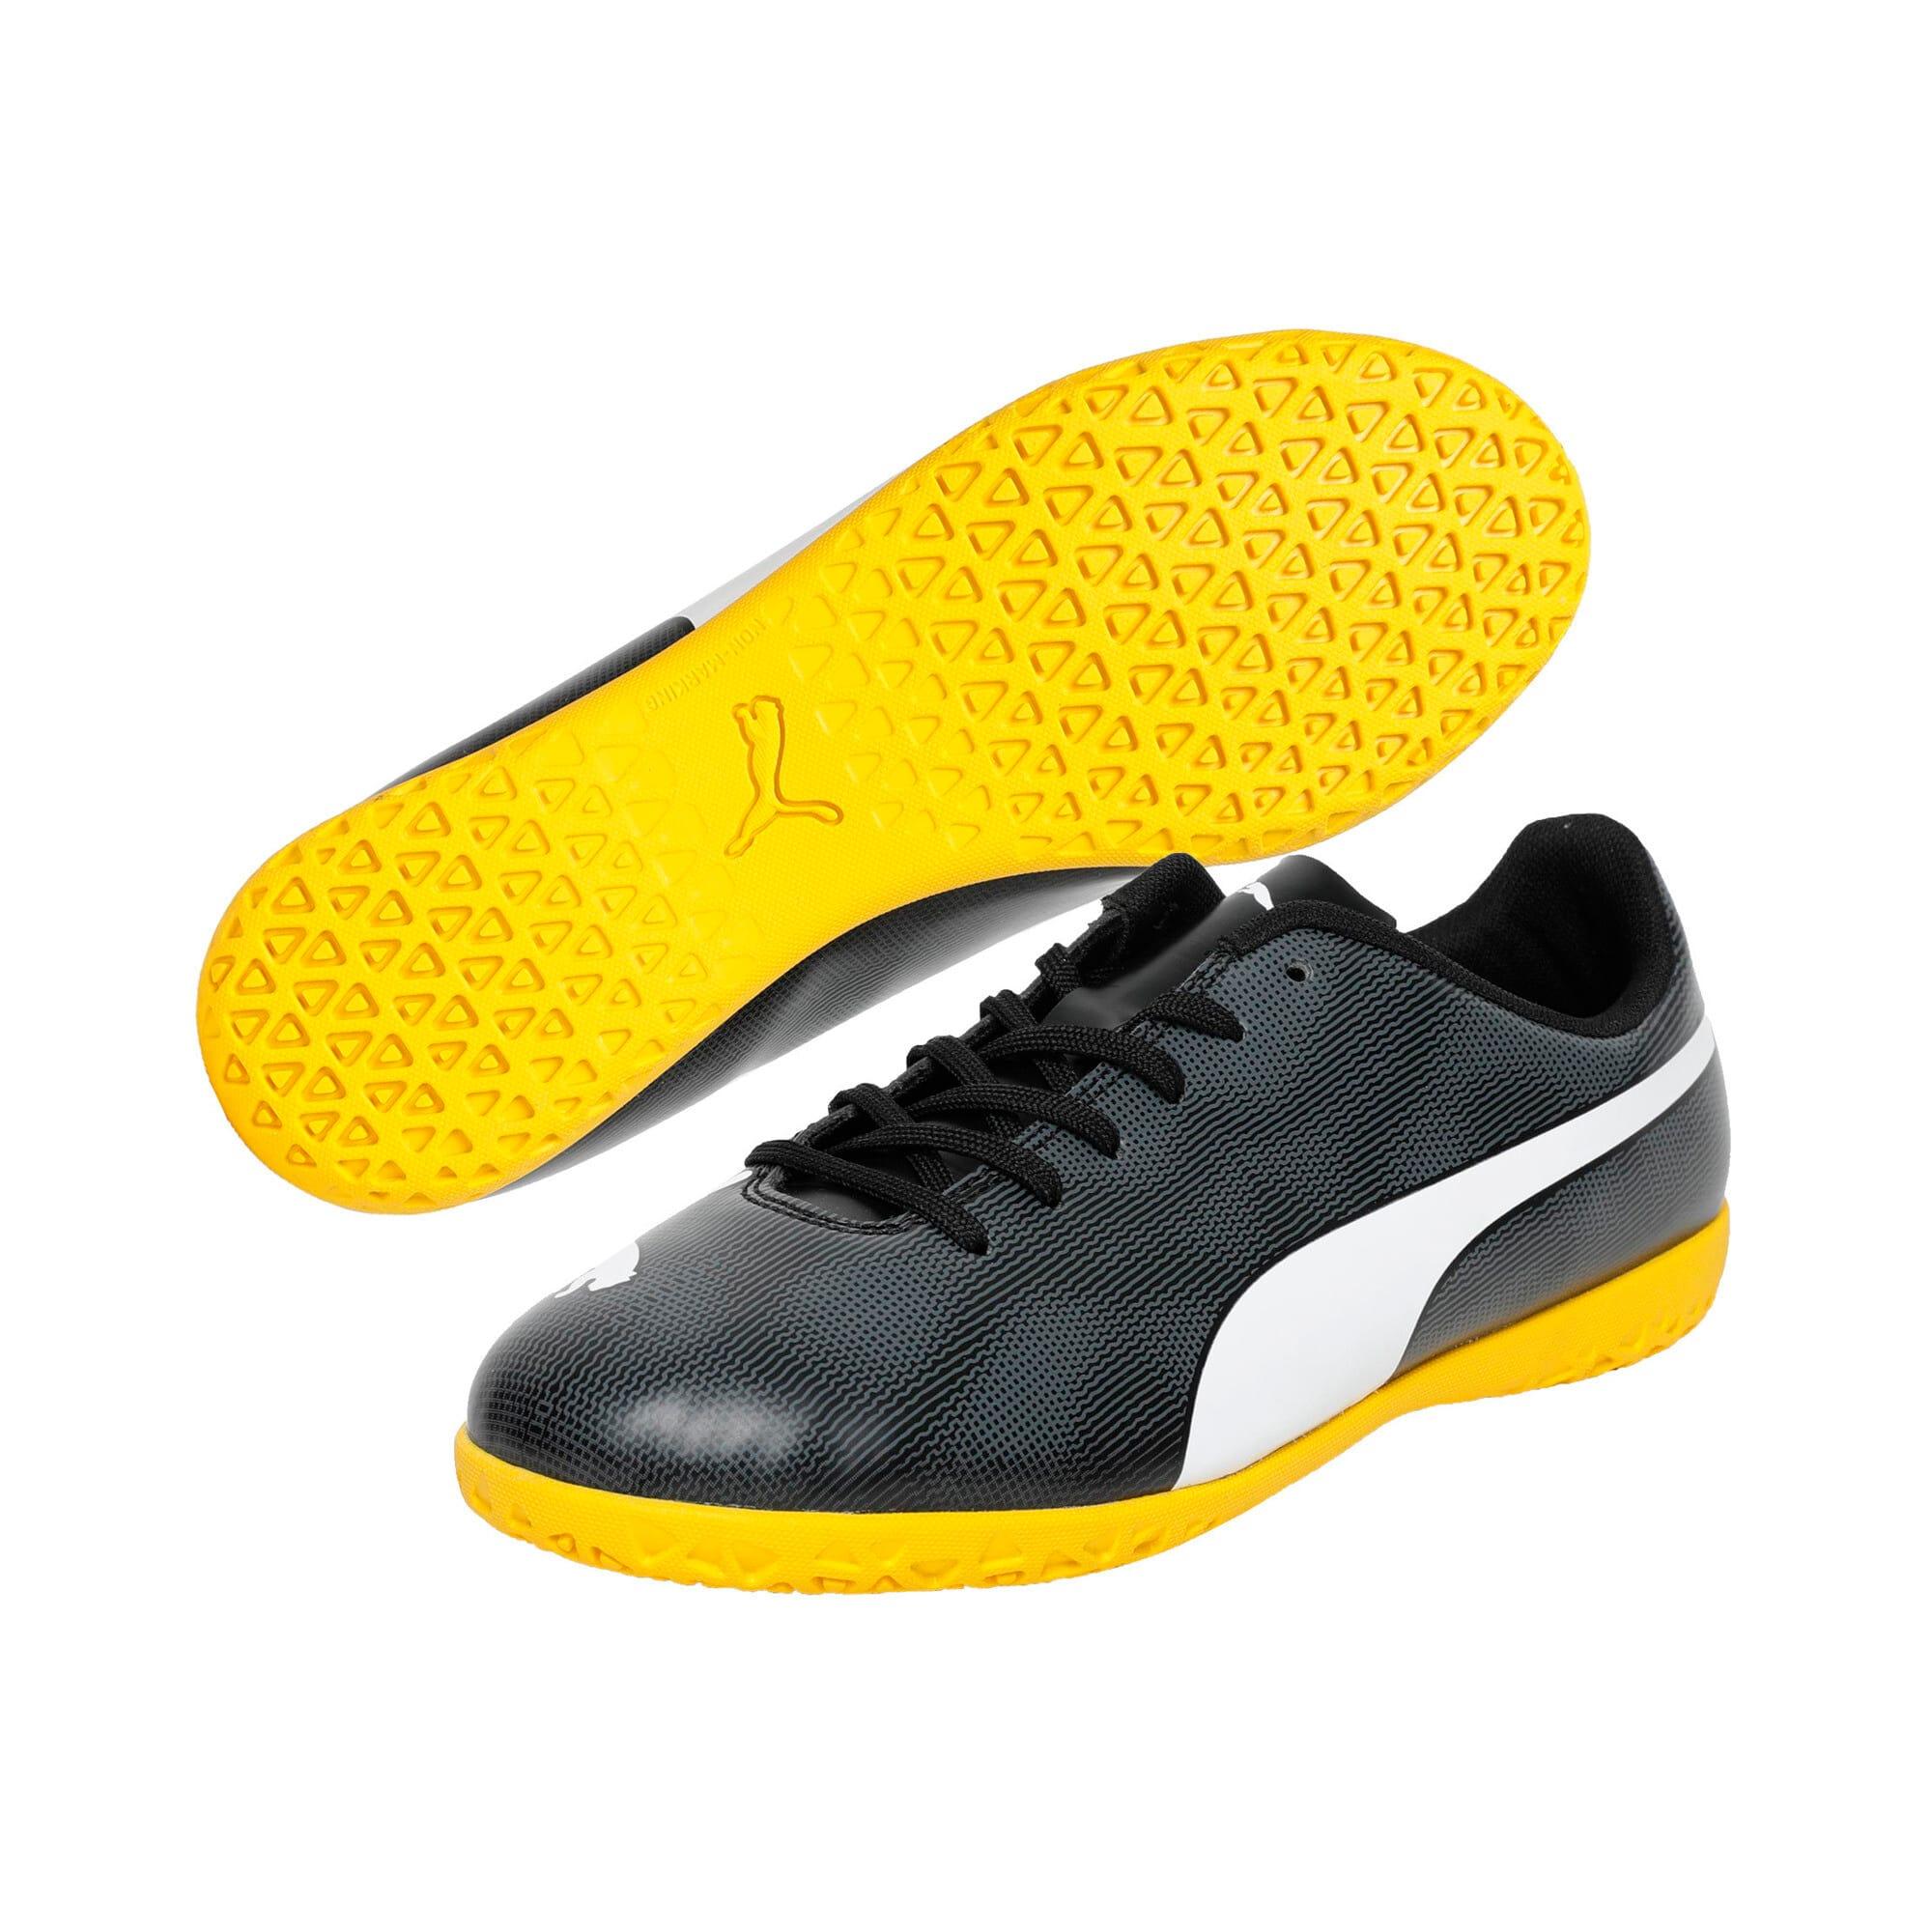 Thumbnail 2 of Rapido IT Youth Football Boots, Black-White-Iron-Yellow, medium-IND